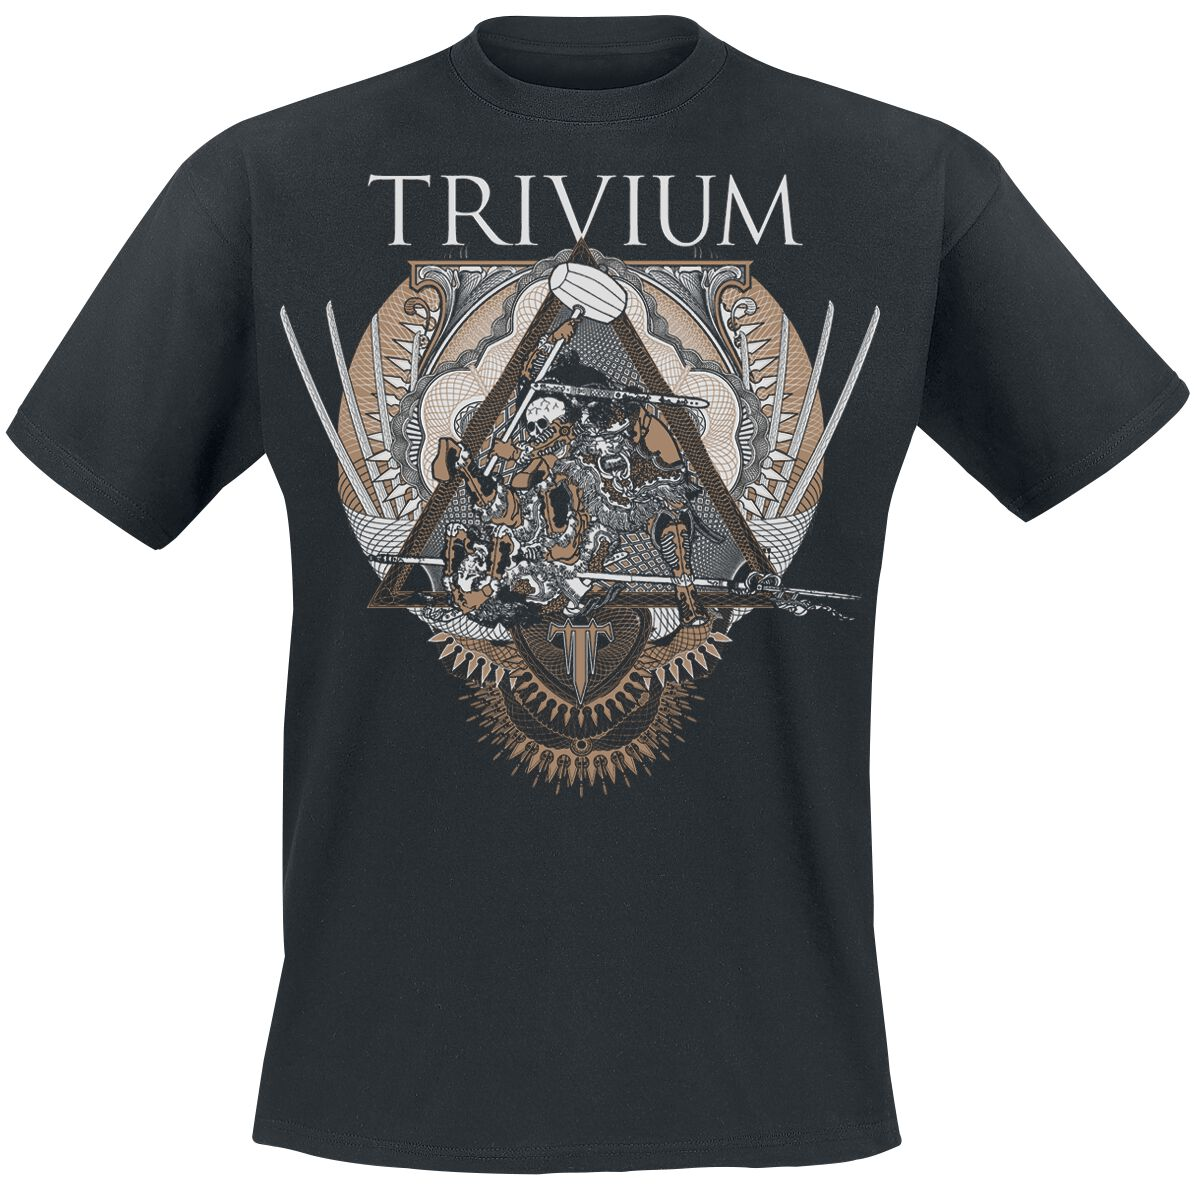 Zespoły - Koszulki - T-Shirt Trivium Triangular War T-Shirt czarny - 369583